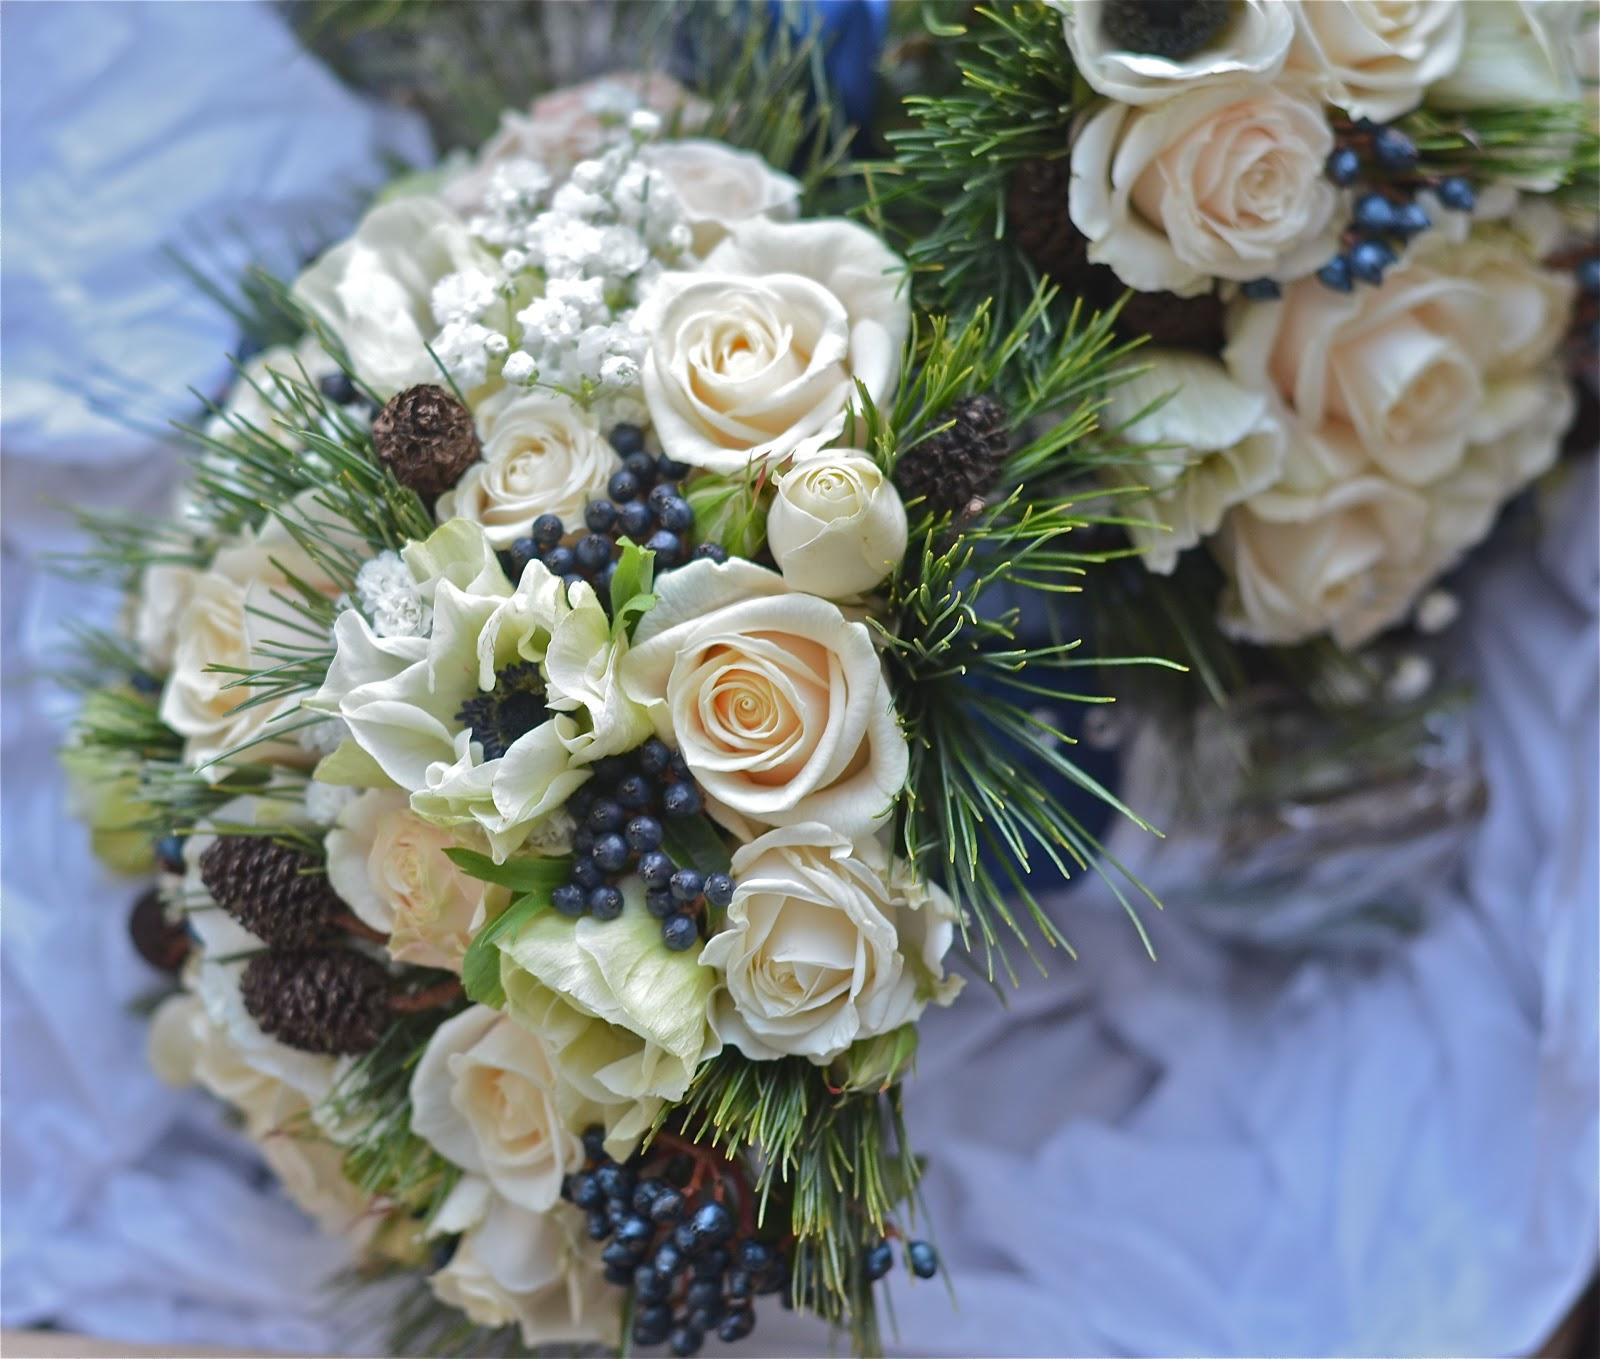 december wedding flowers photo - 1